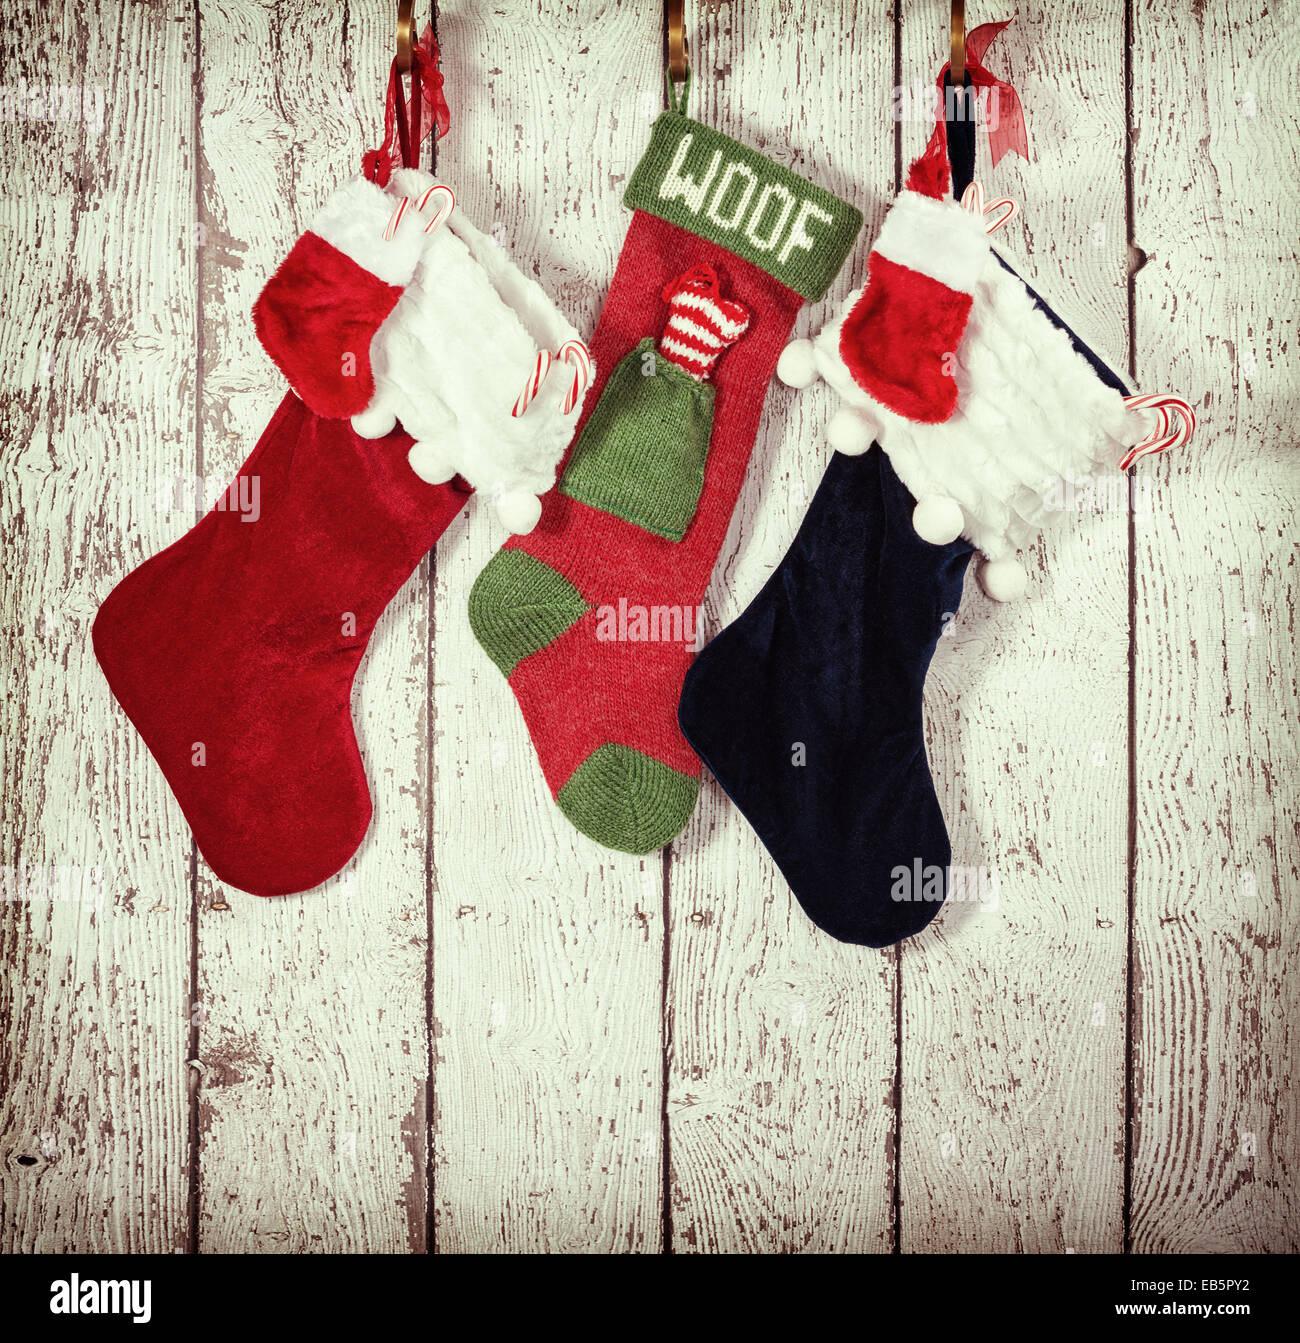 Christmas stocking hanging against rustic wood background - Stock Image